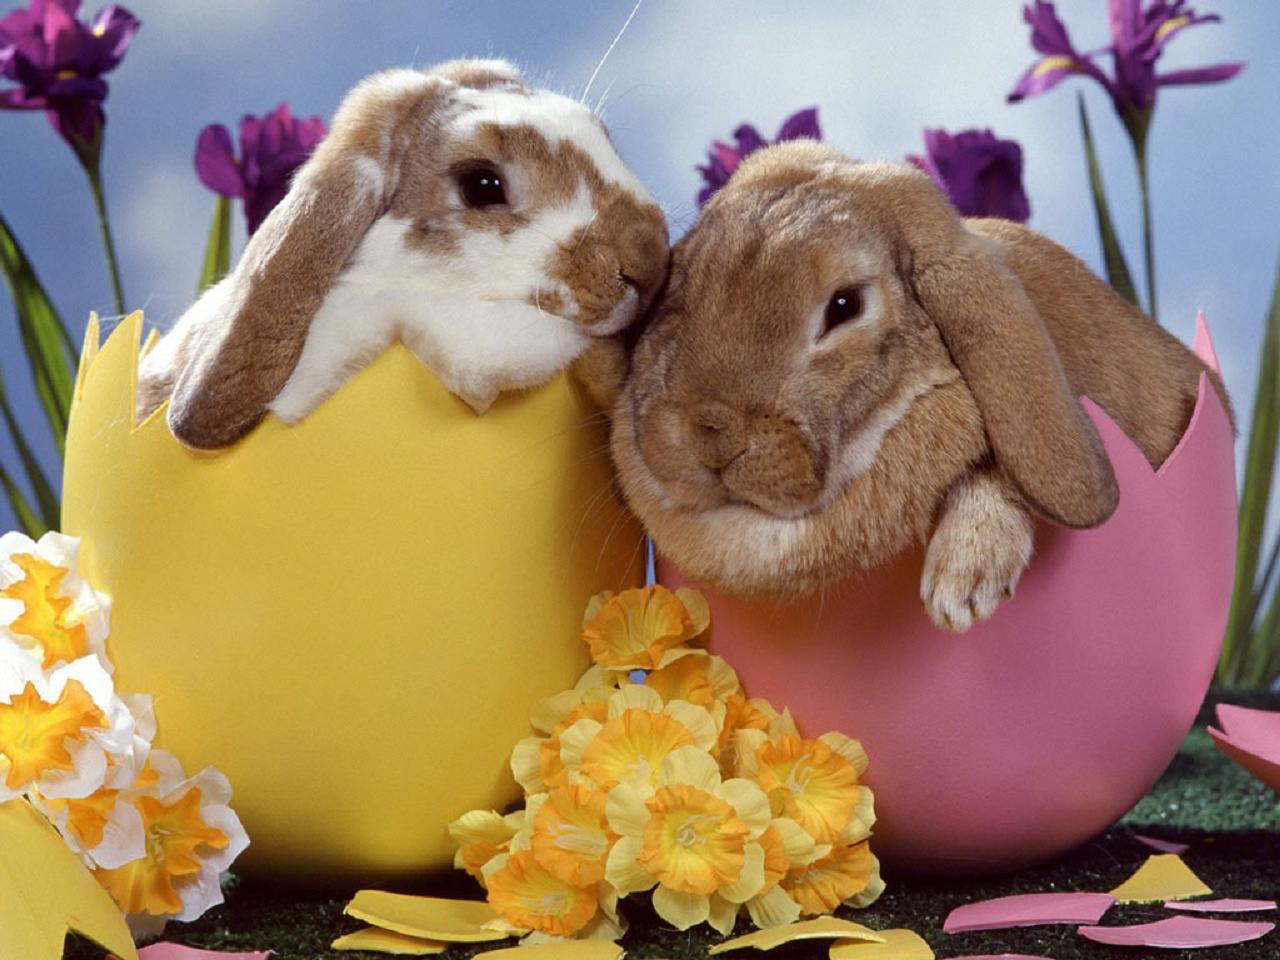 http://2.bp.blogspot.com/-248LoR6g8mY/T4FoIFYLPvI/AAAAAAAABKc/I8P0ipvbZVs/s1600/easter-bunny_cute.jpeg